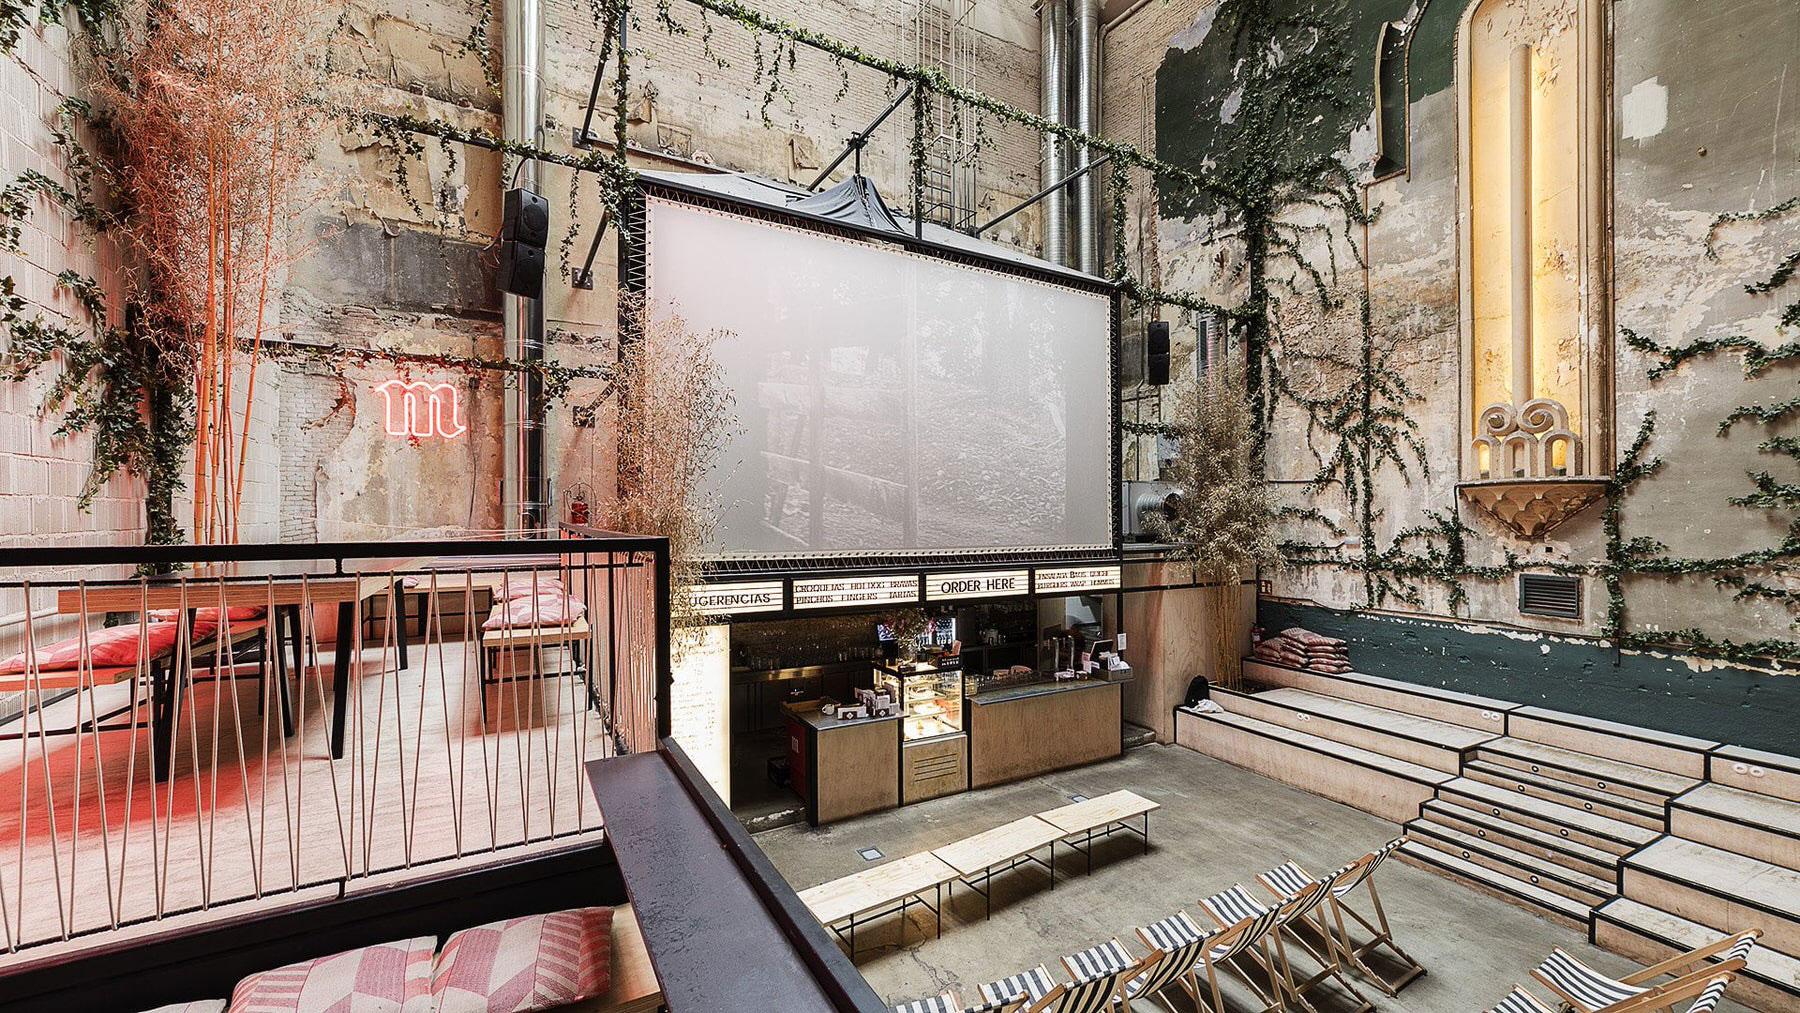 Sala Equis, Madrid Cinema Interiors, Plantea Estudio | Yellowtrace